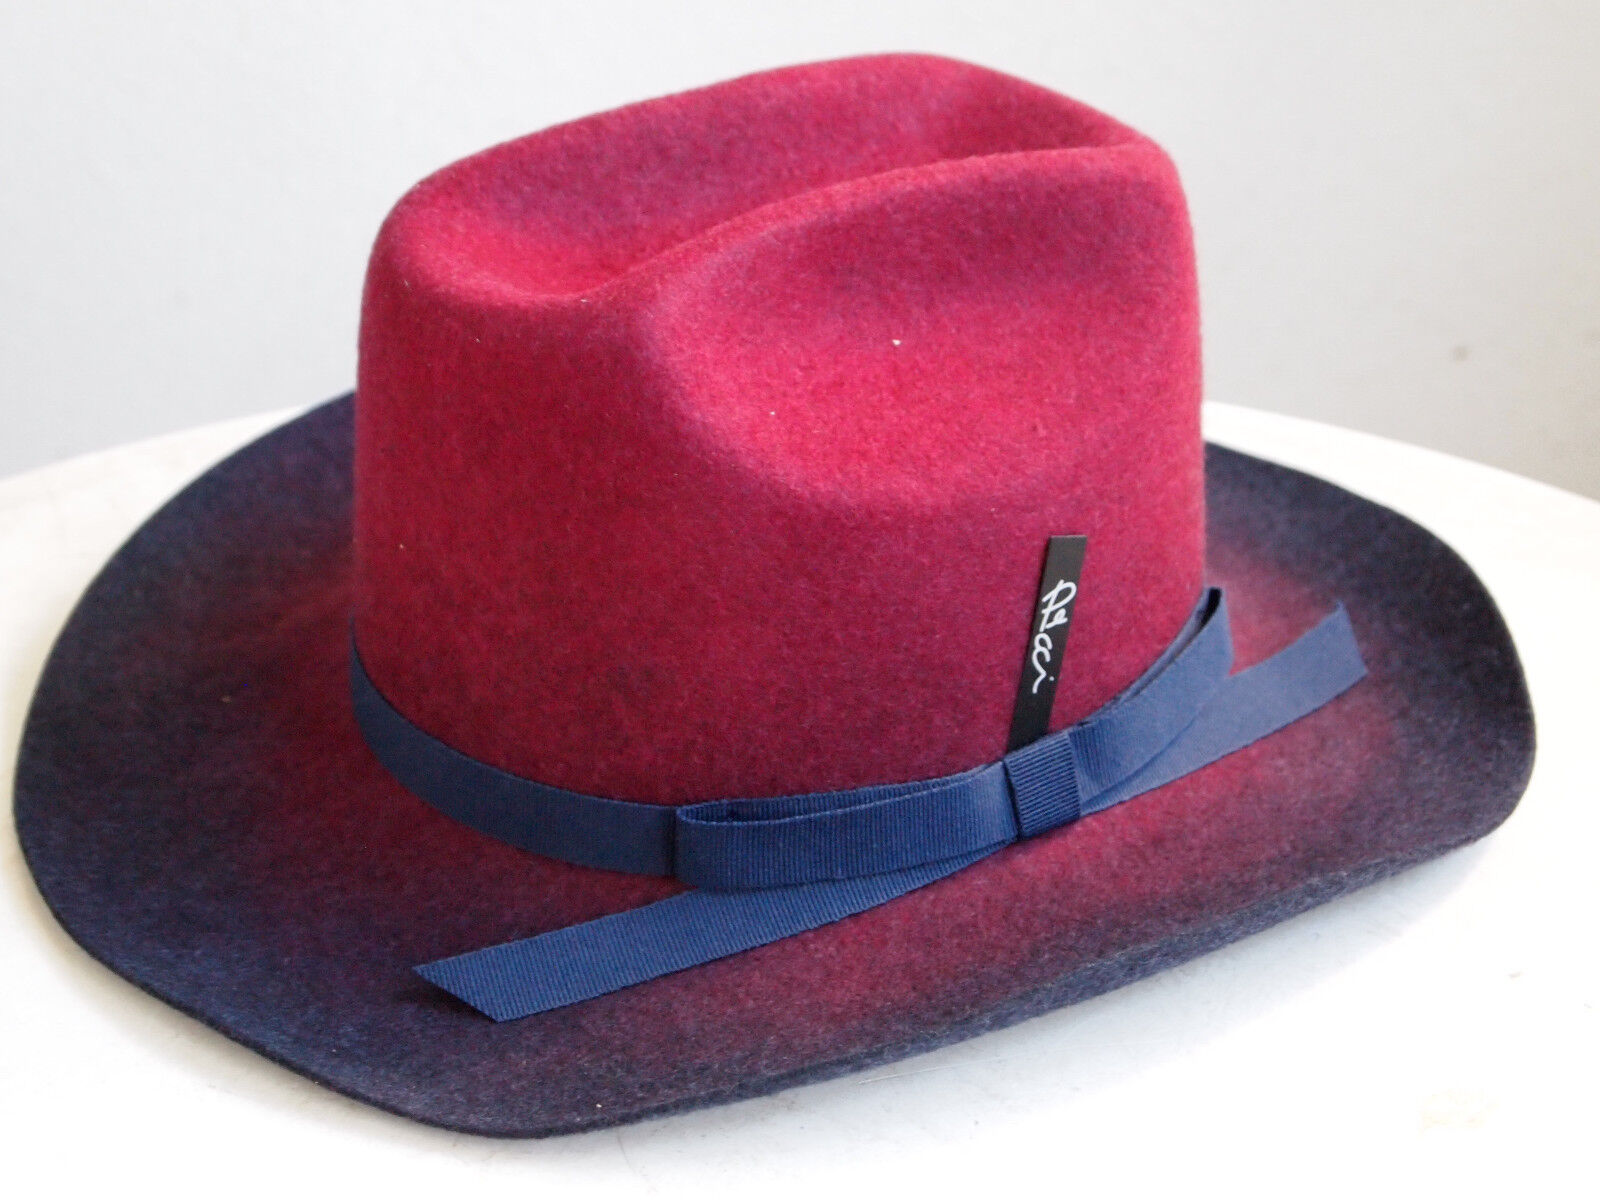 Texas++++ edler italienischer Designer Filzhut Cowboy Hut 100% Wolle Hipster